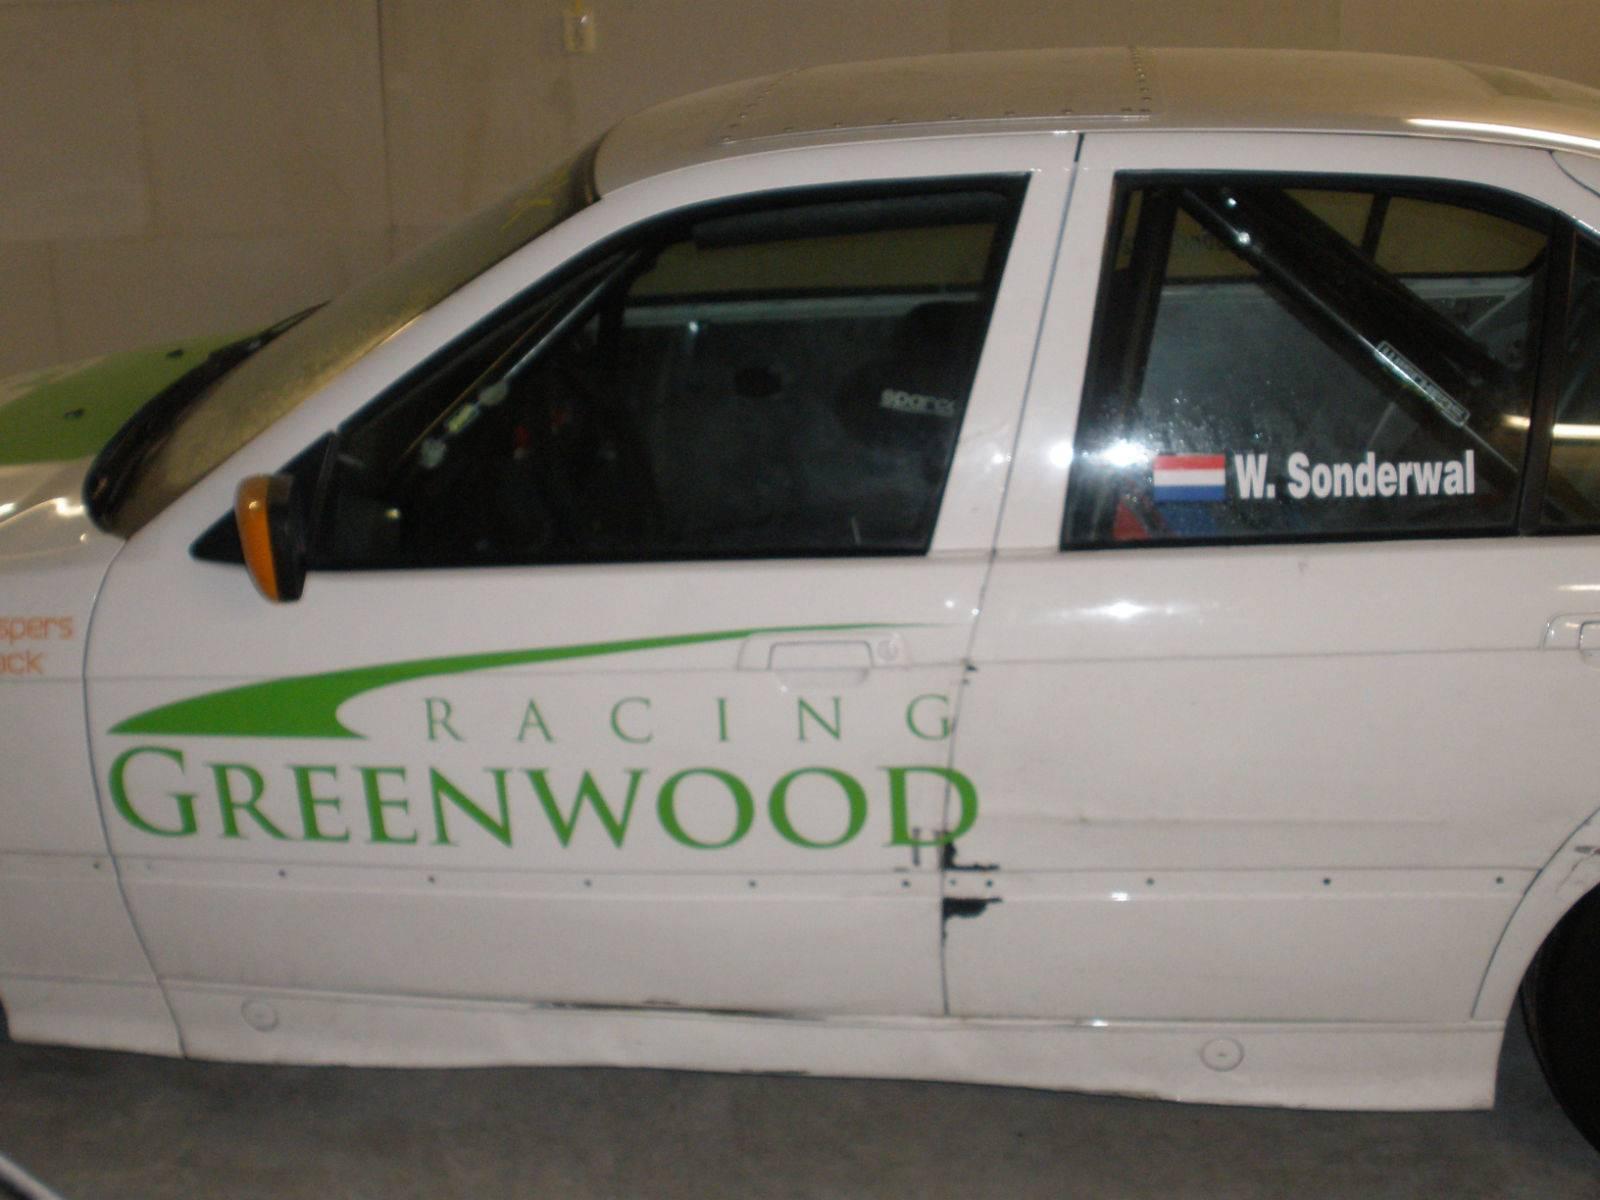 E36 greenwood-racing.nl 08